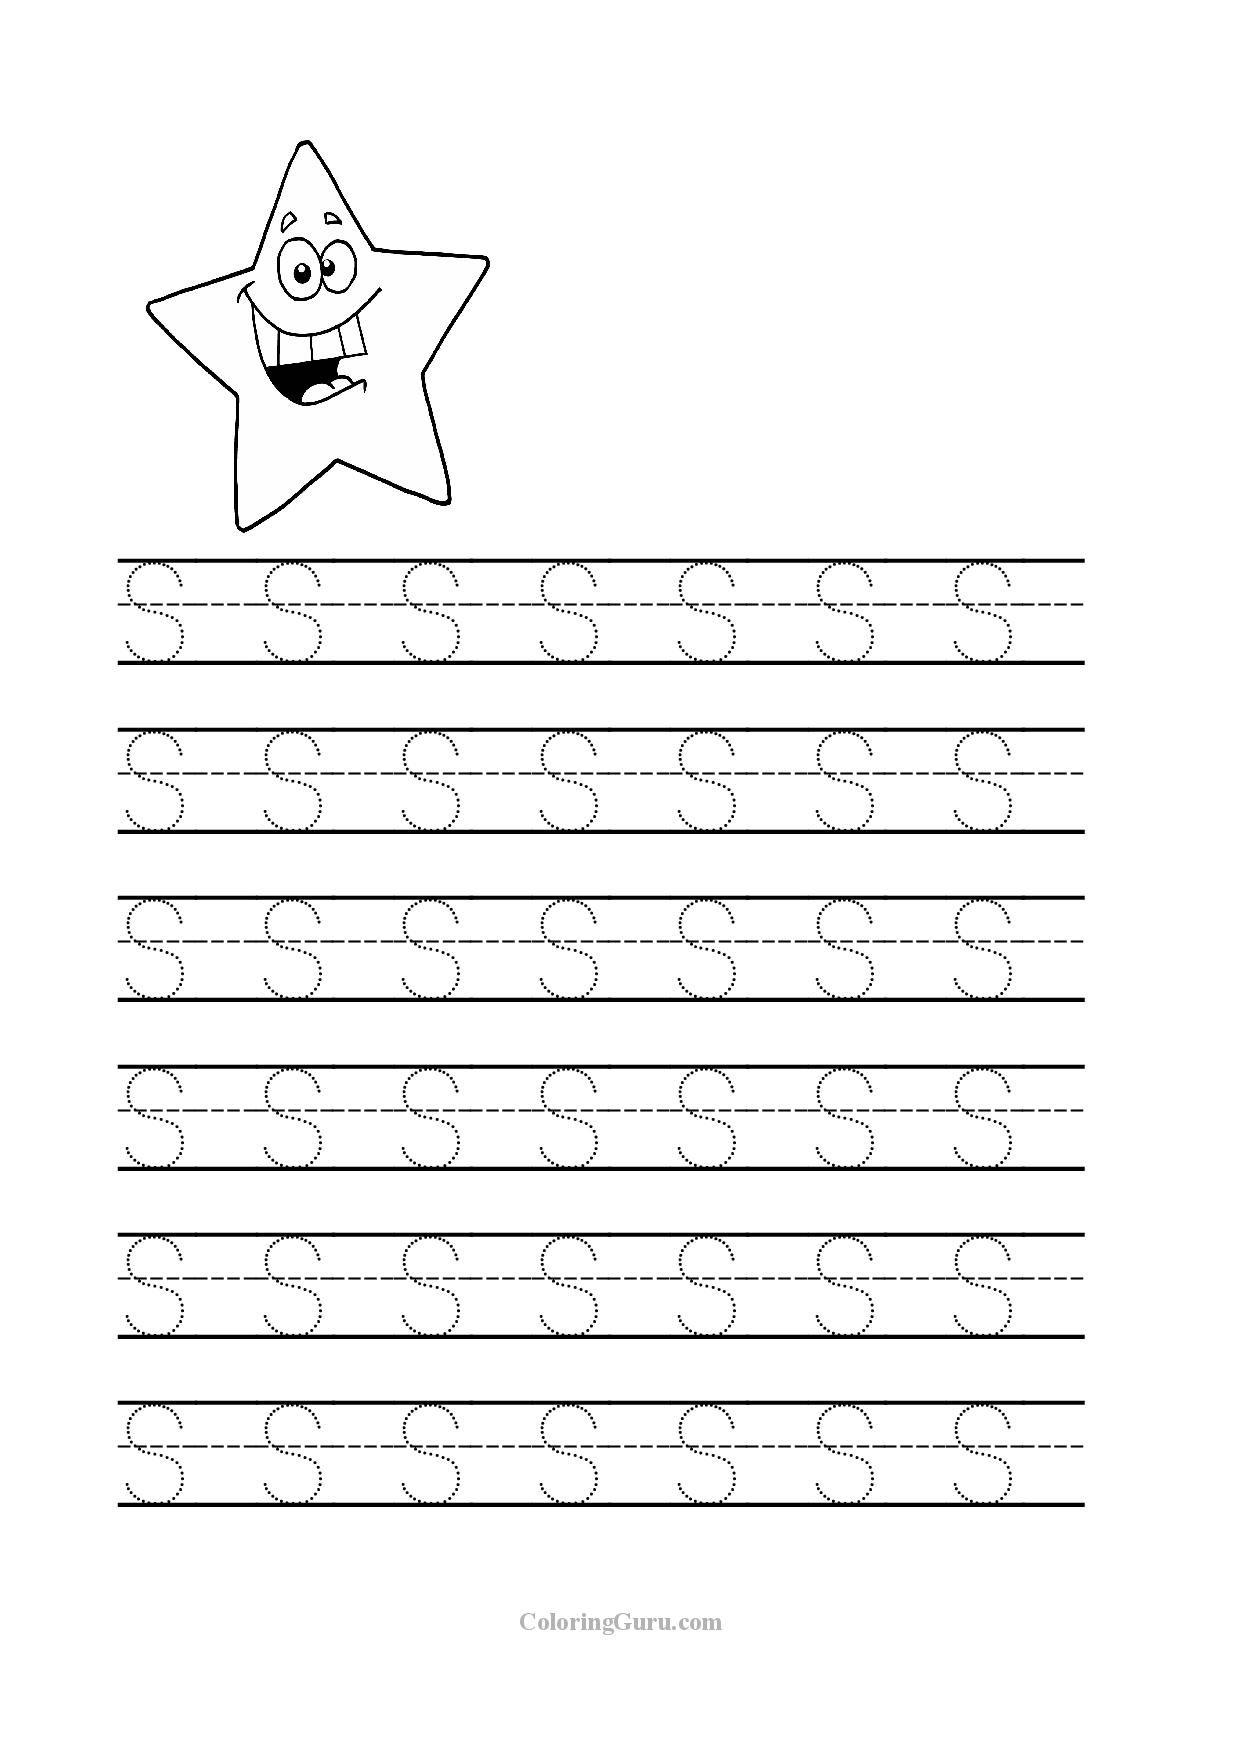 Free Printable Tracing Letter S Worksheets For Preschool intended for Tracing Letter S Worksheets For Kindergarten